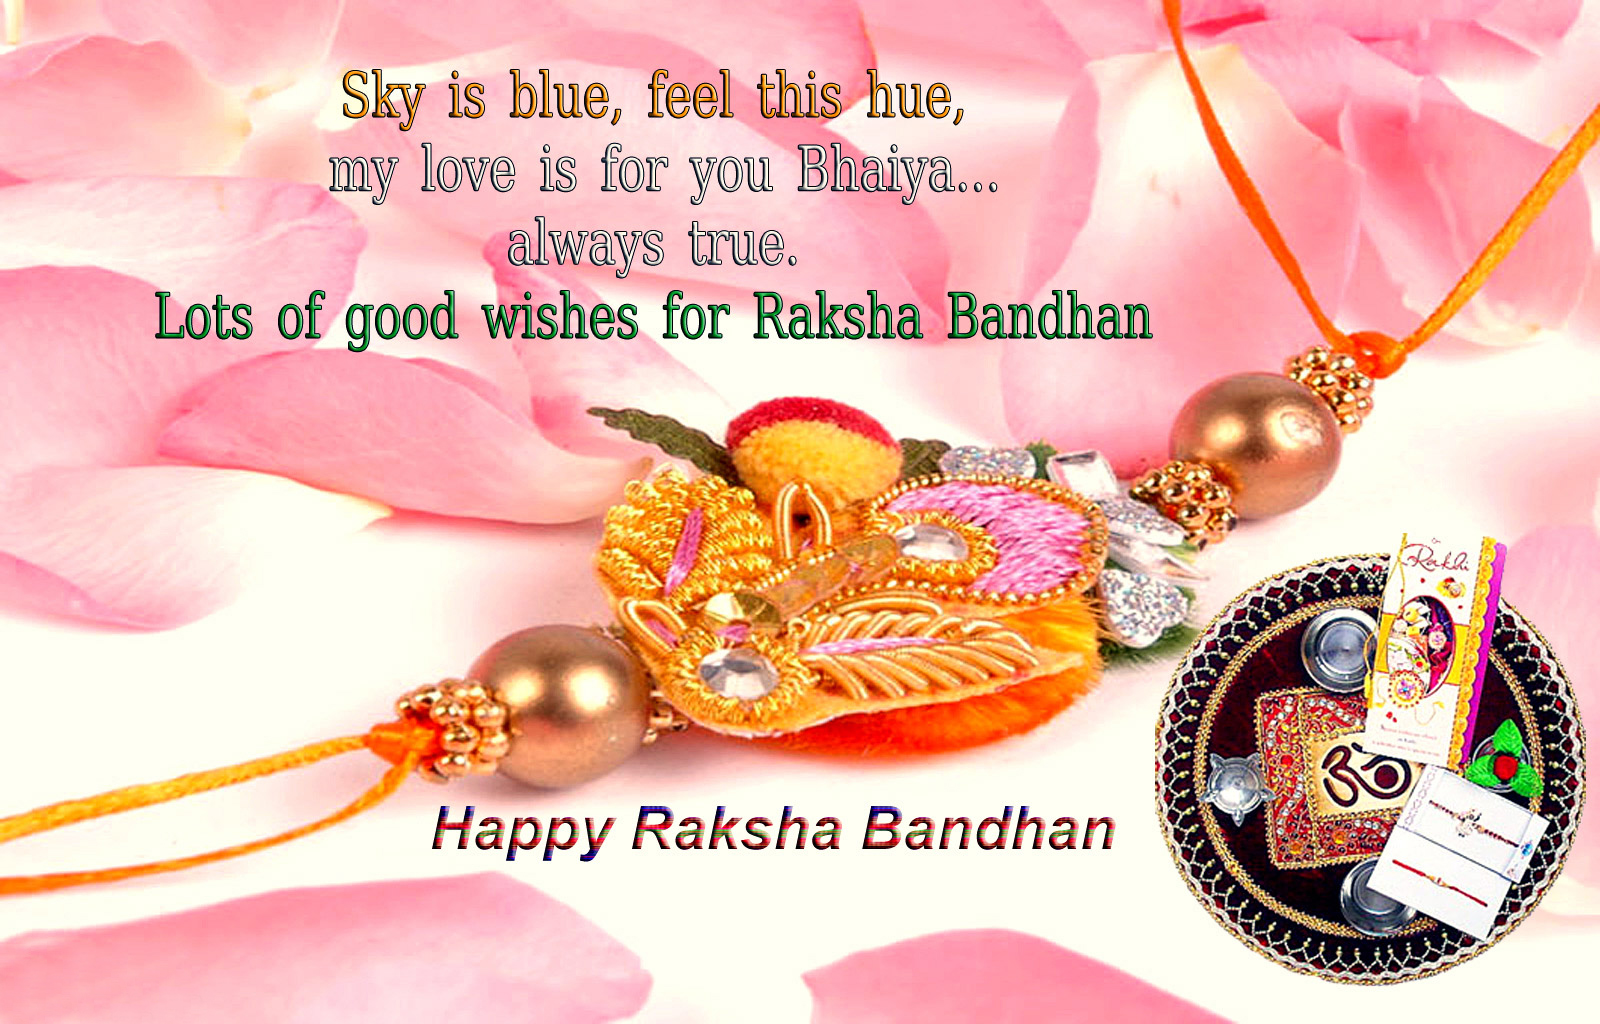 Happy Raksha Bandhan Wishes Images